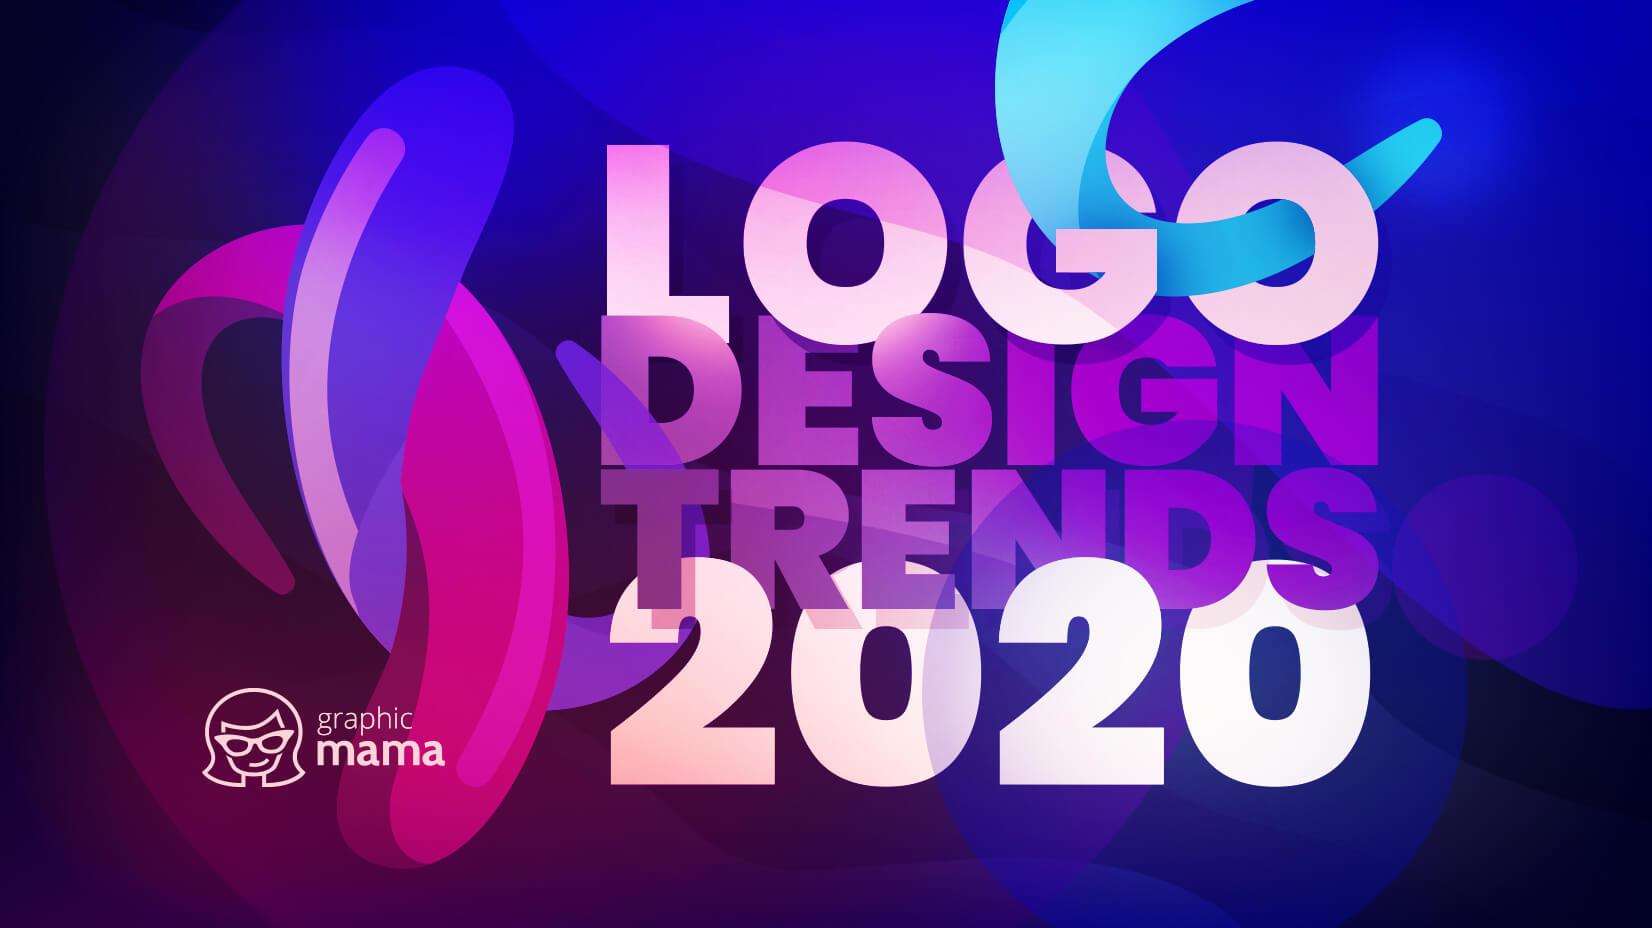 logo-design-trends-2020.